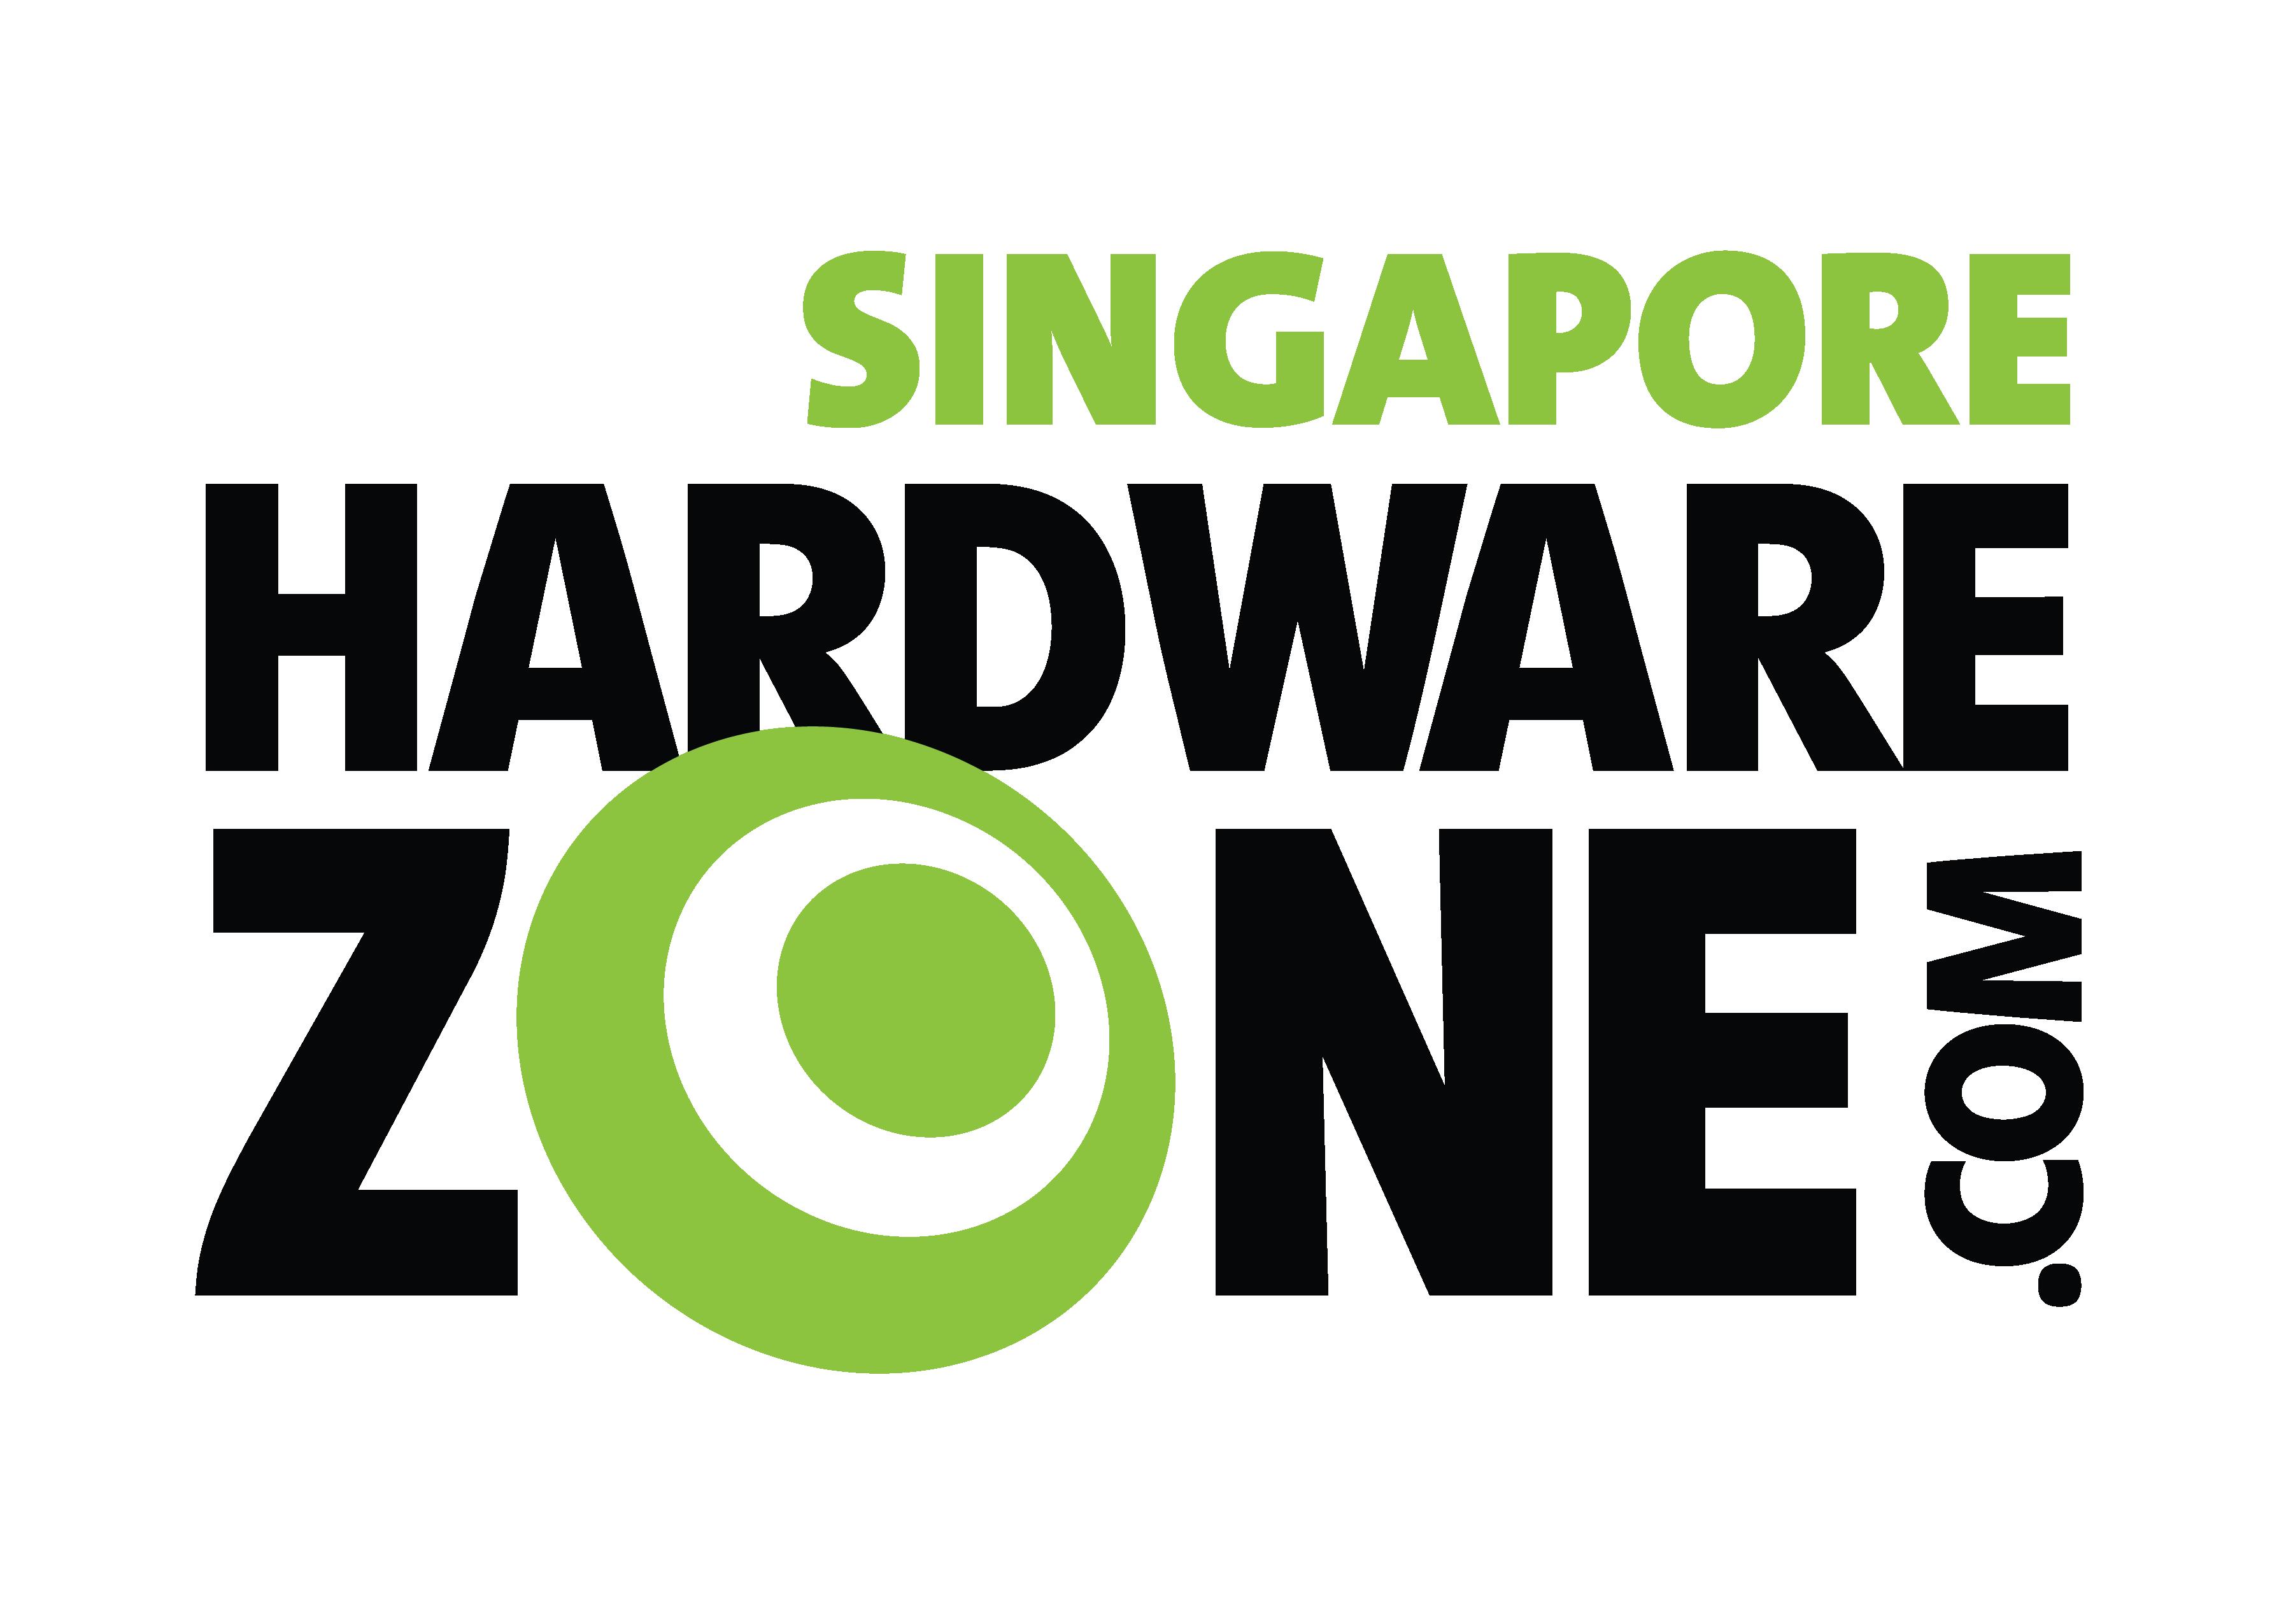 HardwareZone.com